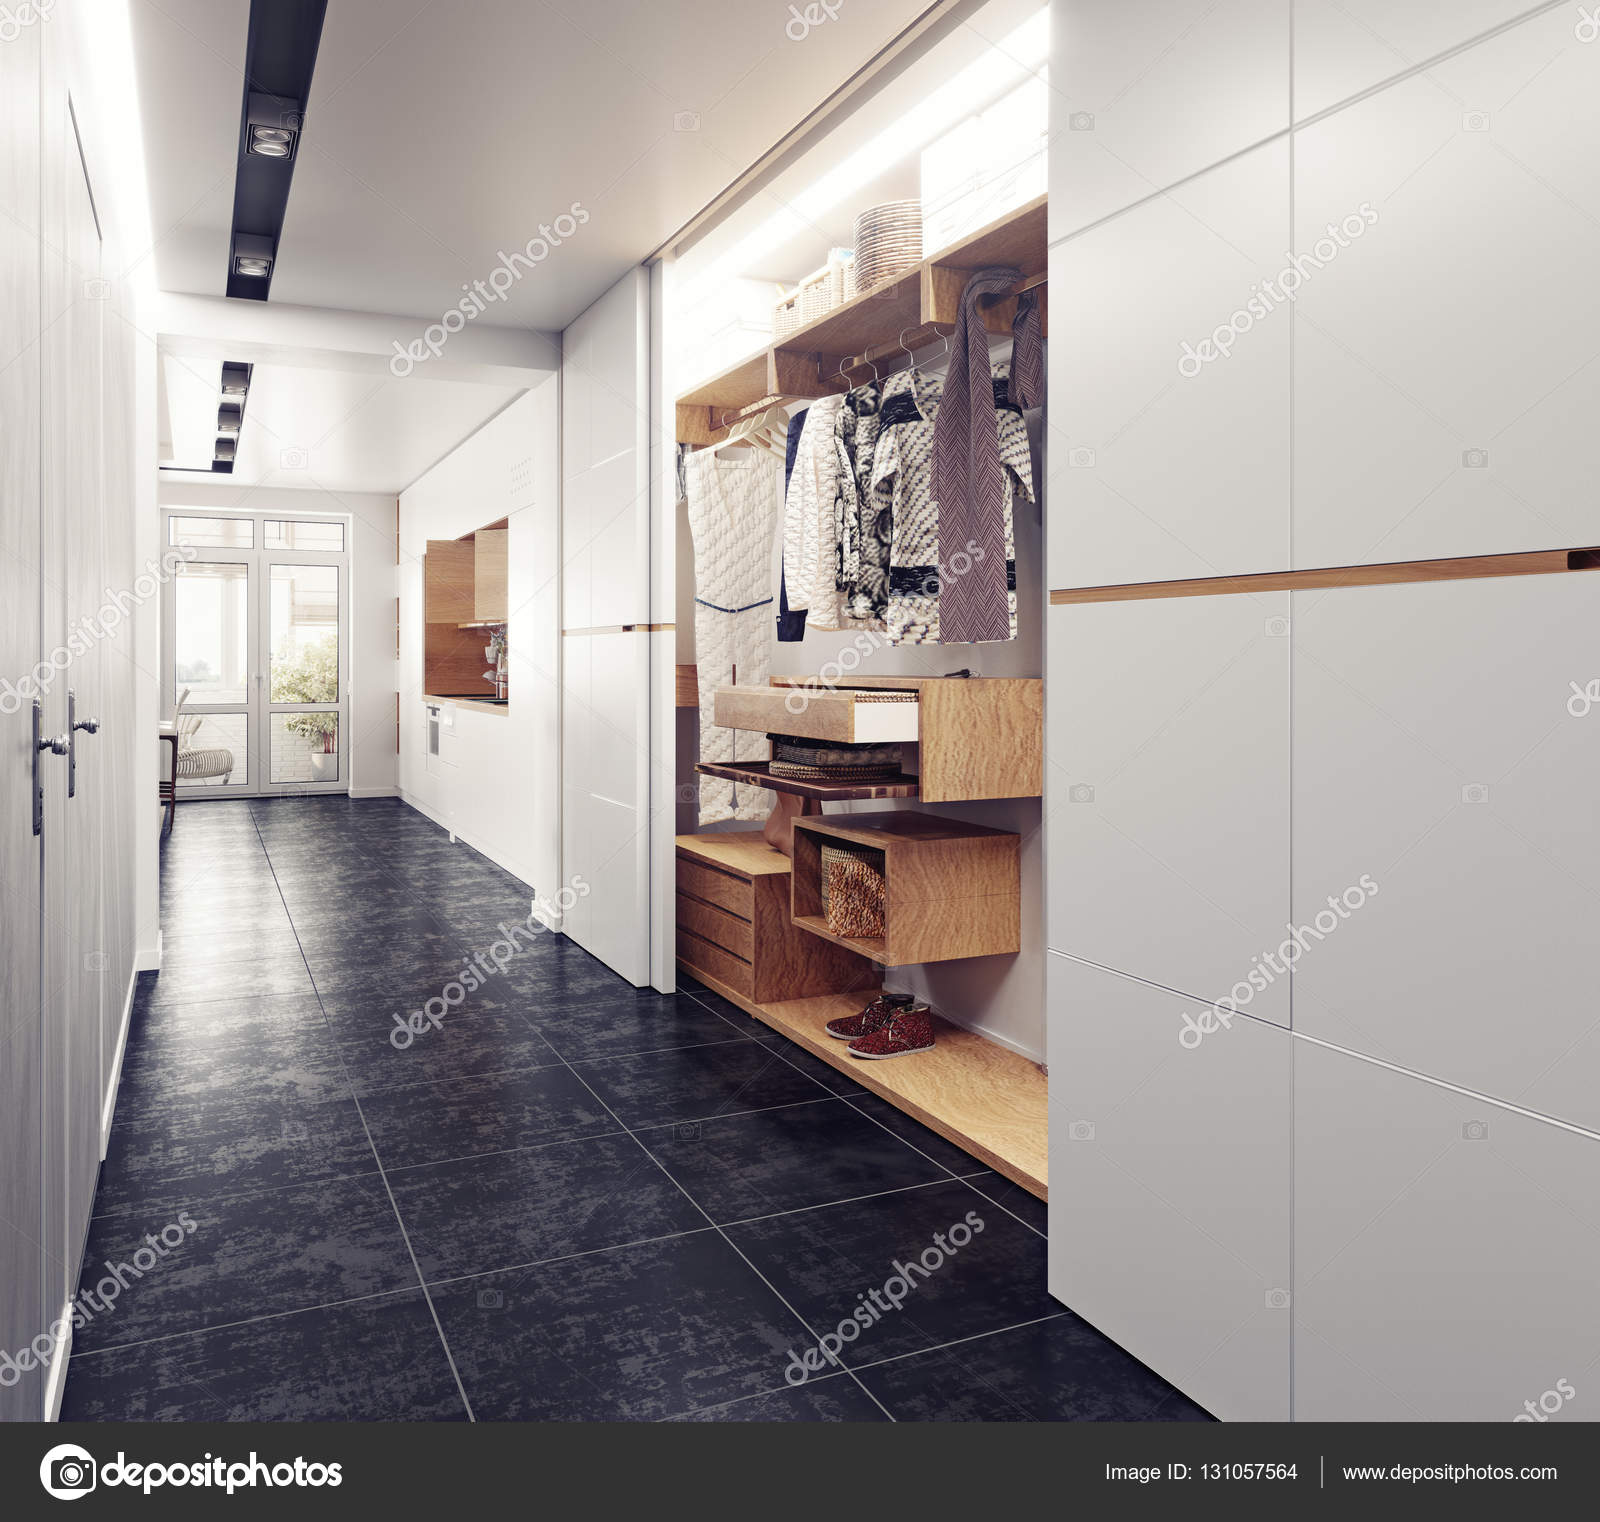 Flur moderne Interieur — Stockfoto © vicnt2815 #131057564